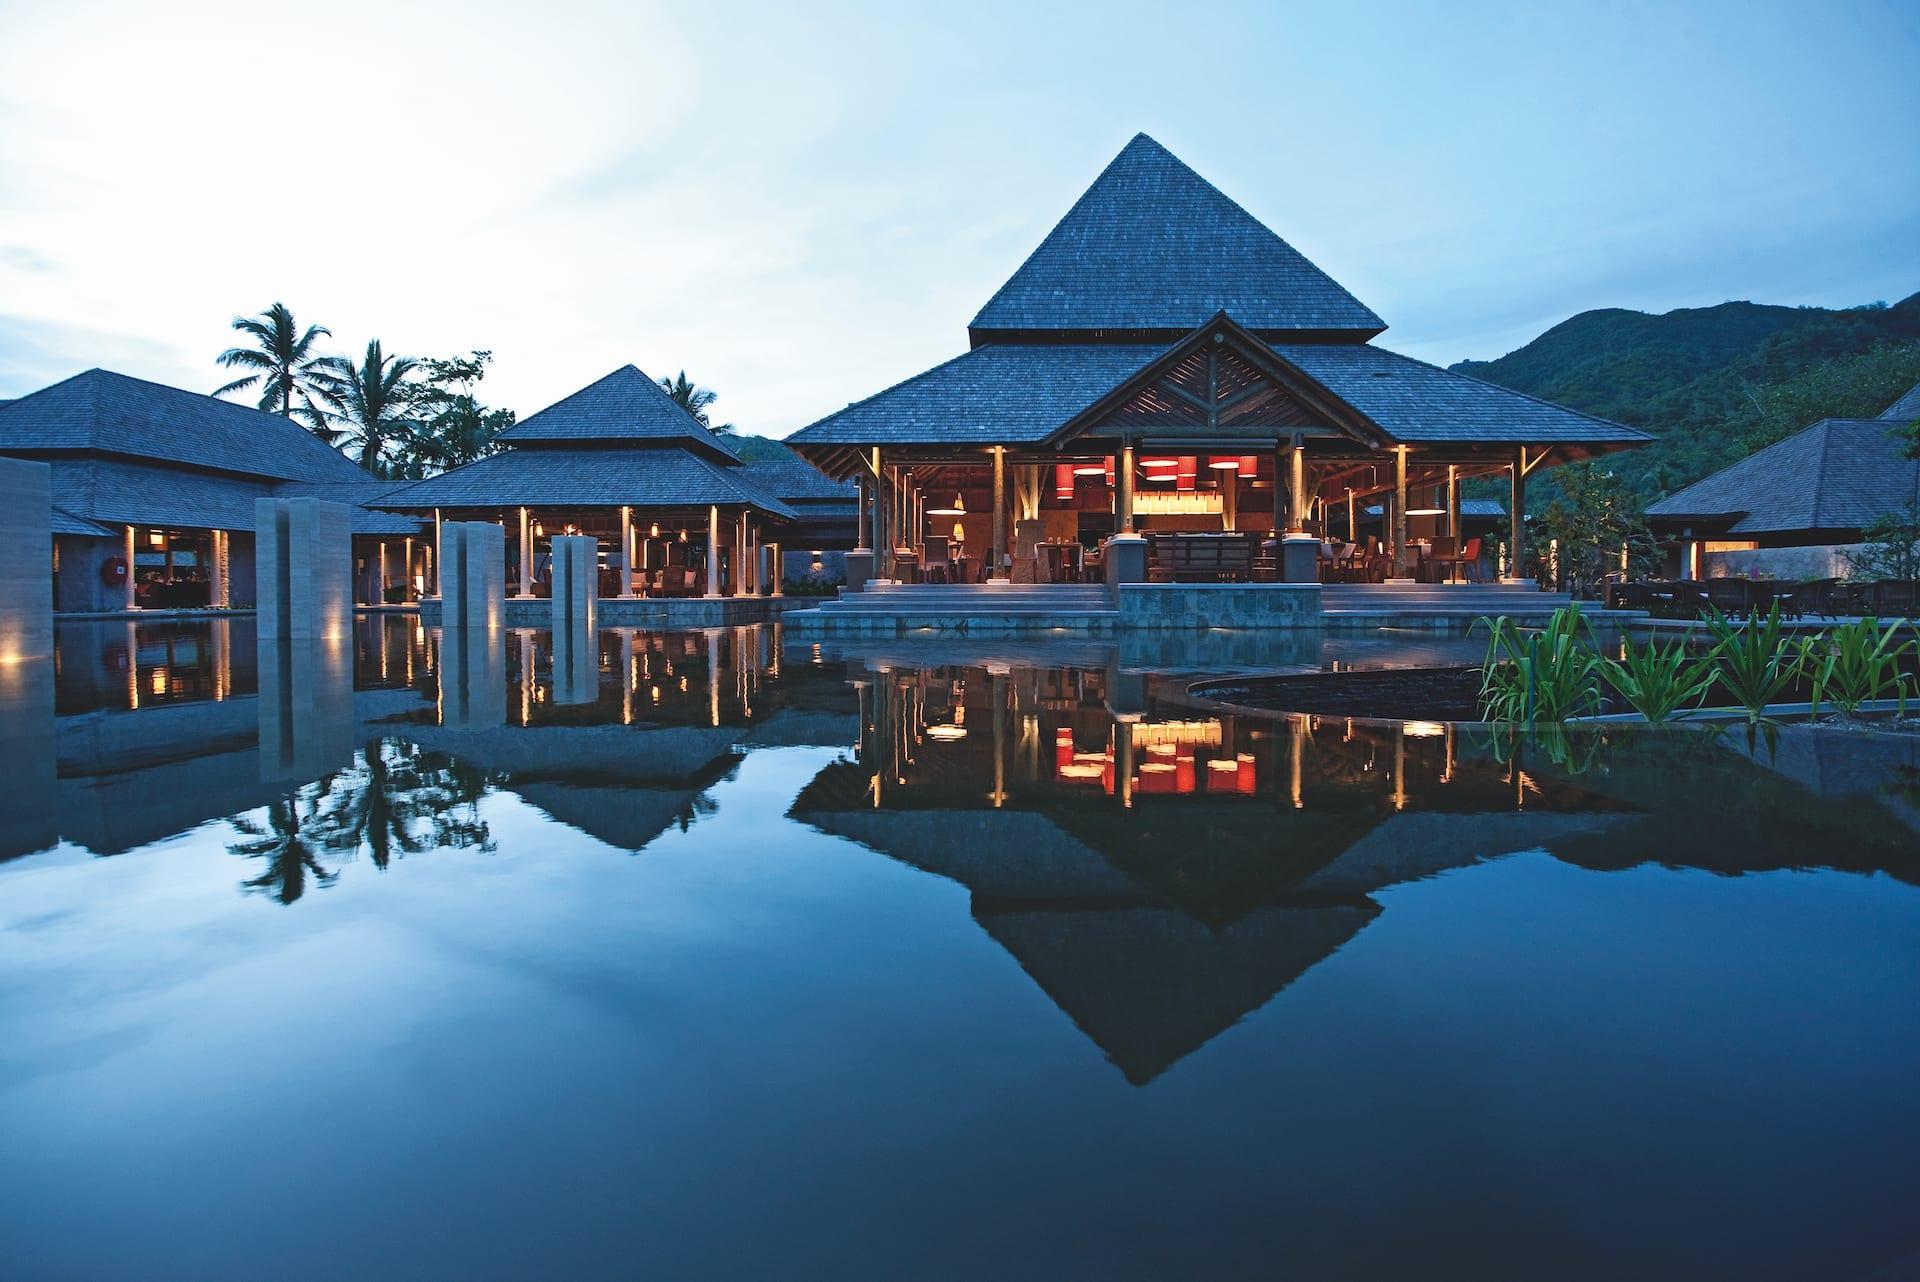 ephelia-seychelle-architecture-main-building-1